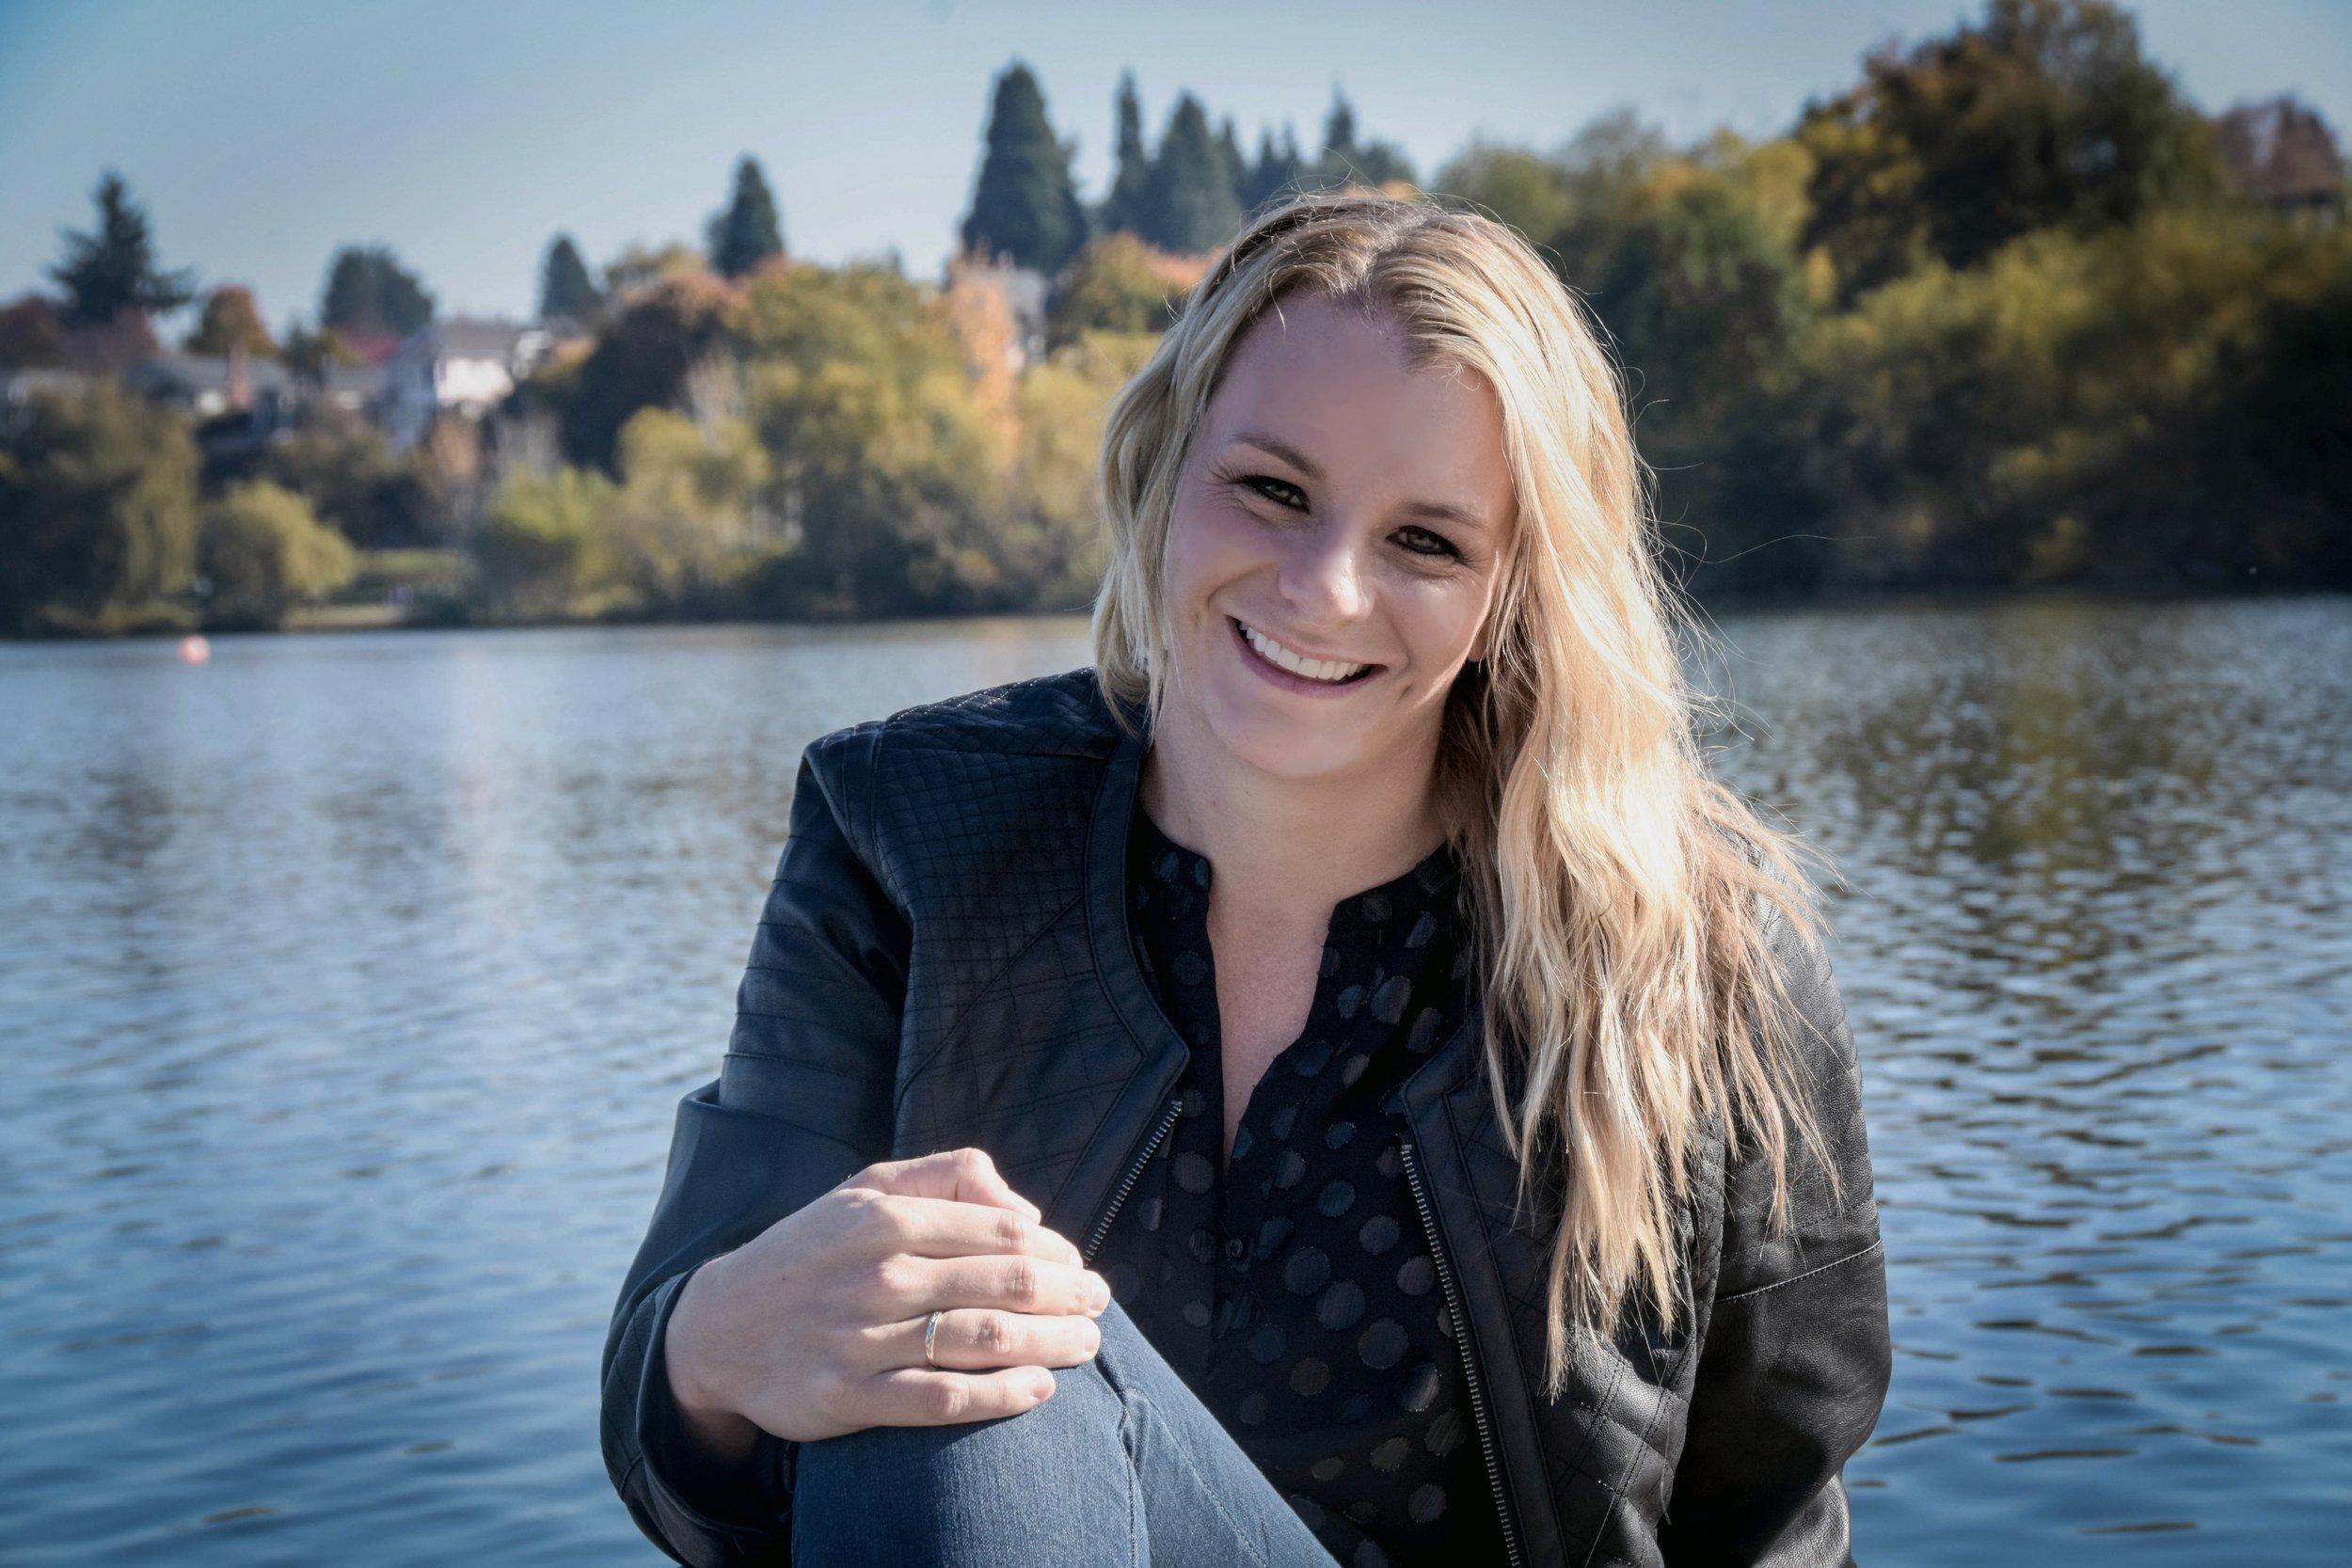 CUTV News Radio spotlights Aamie Benson of Evoke 3 - Adventure illuminates life's greatest gift: the undeniable potential of the human spirit.